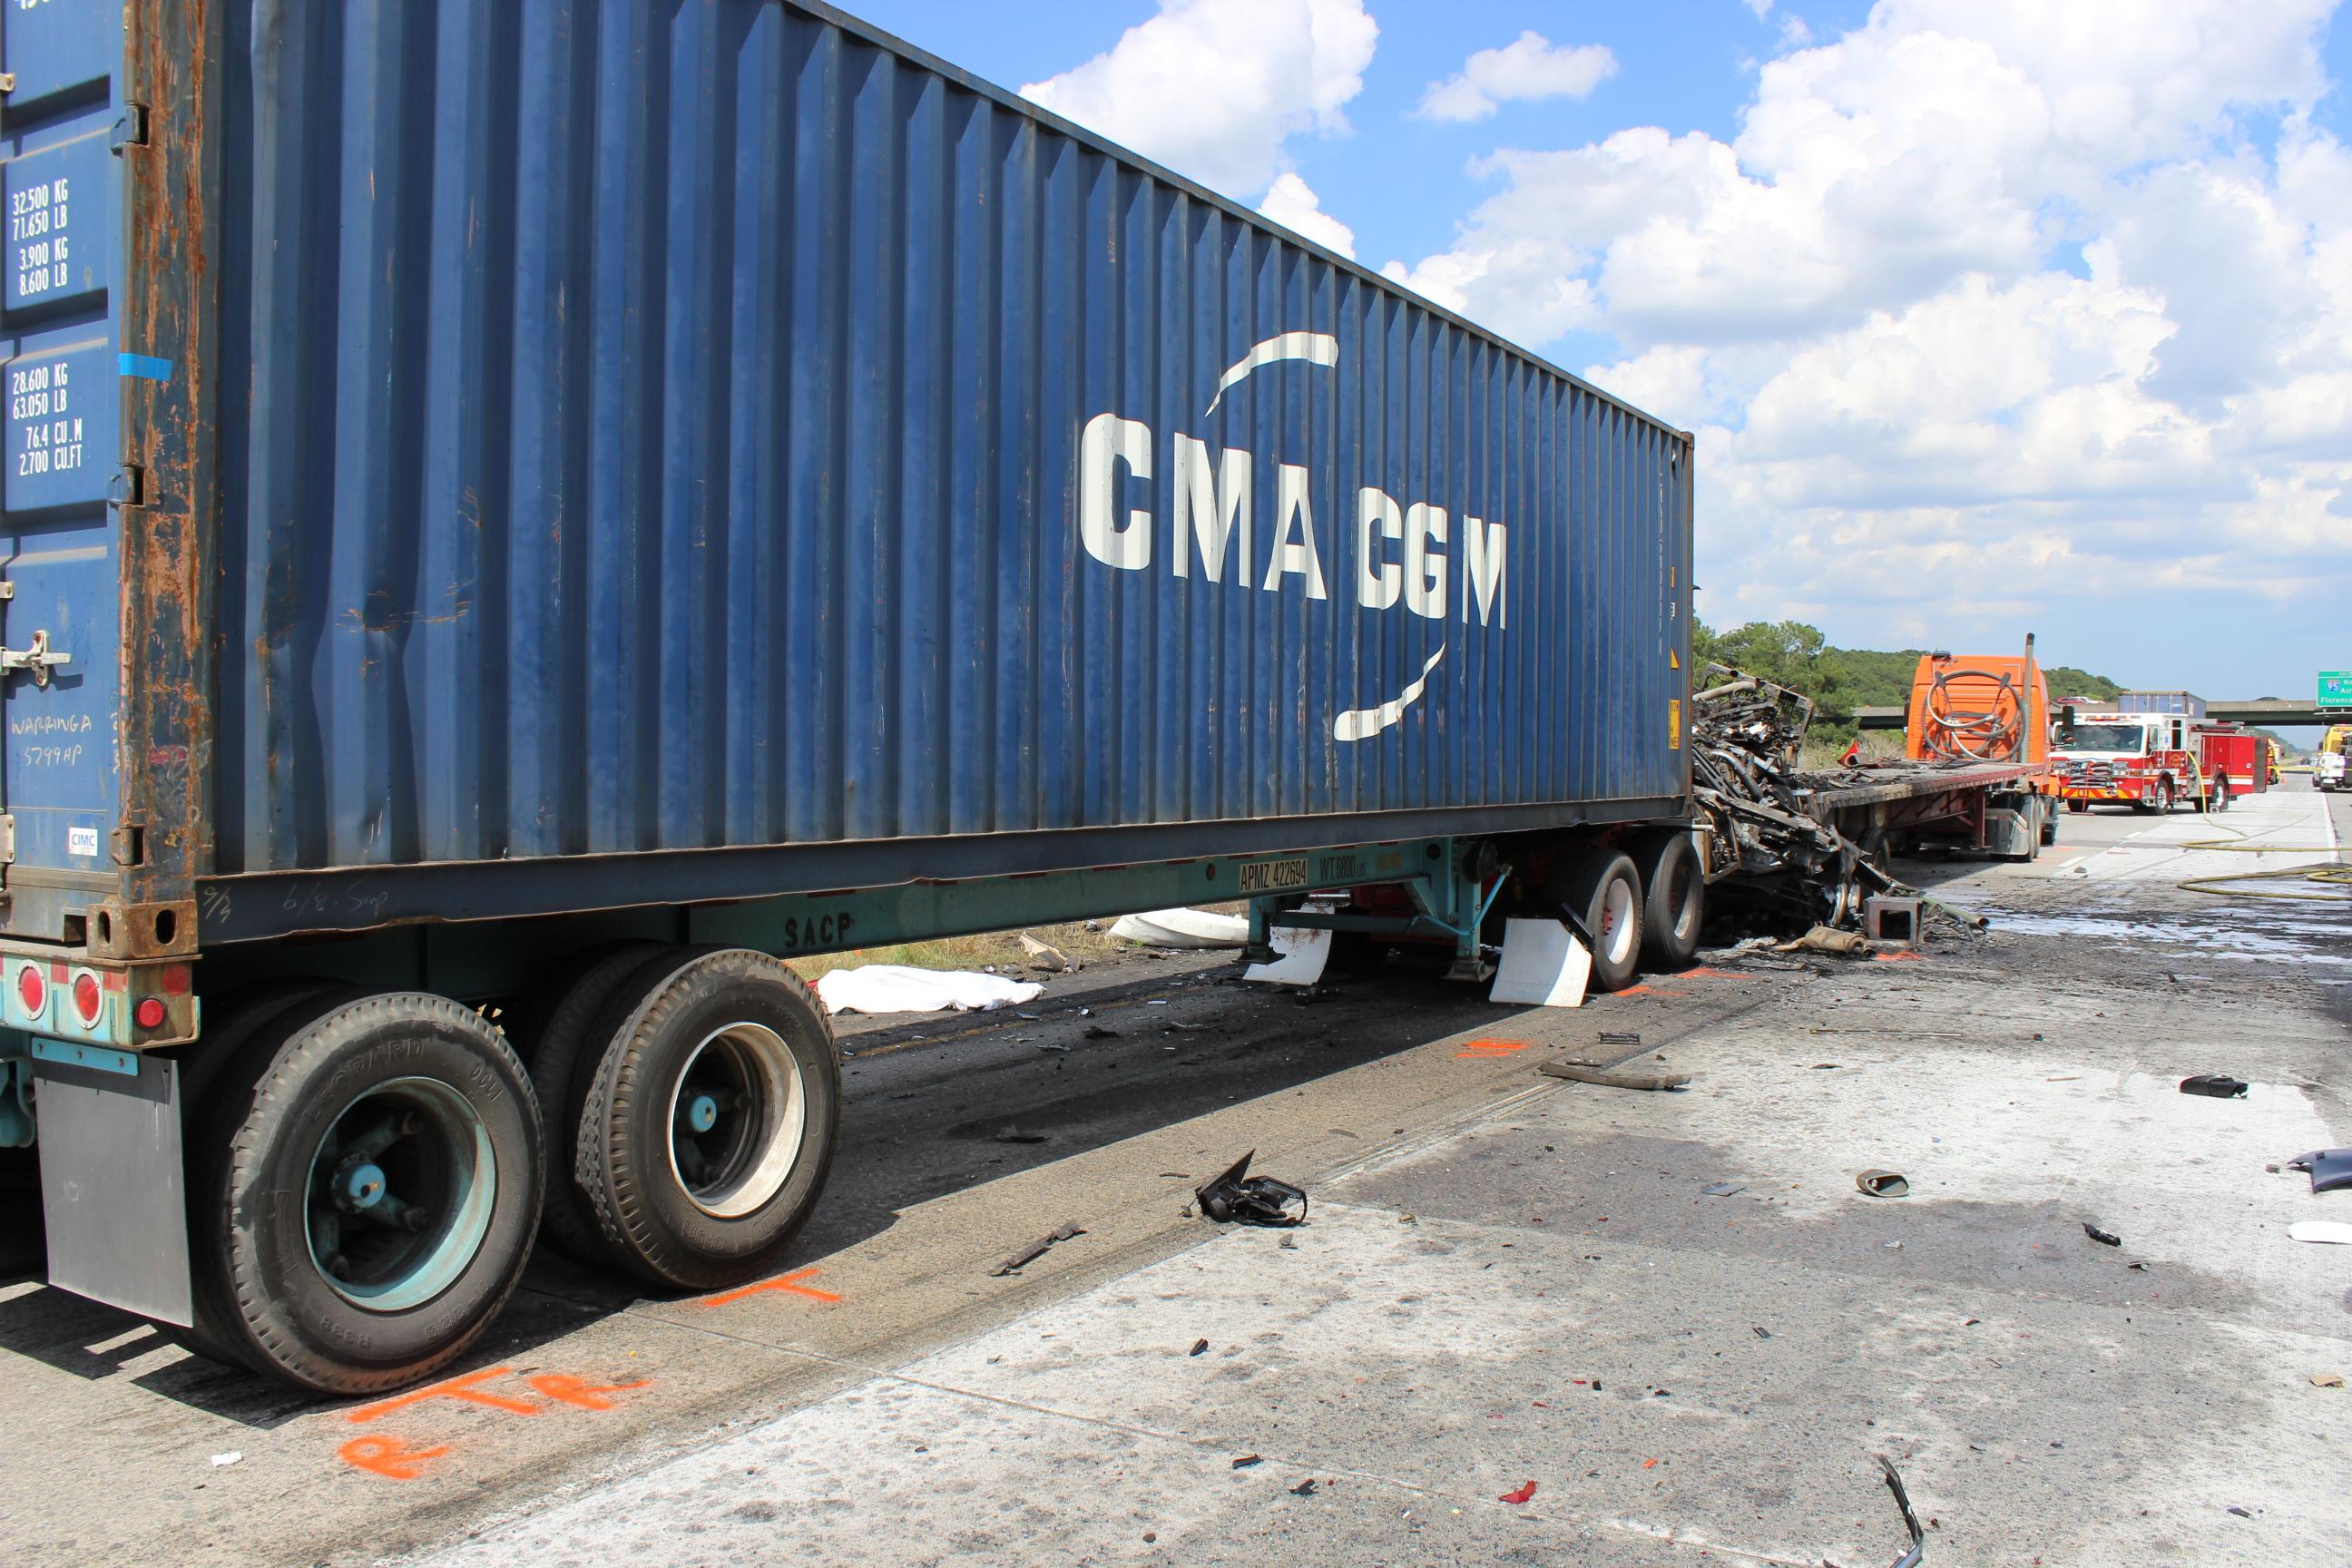 Image gallery intermodal container truck - Intermodal container homes ...